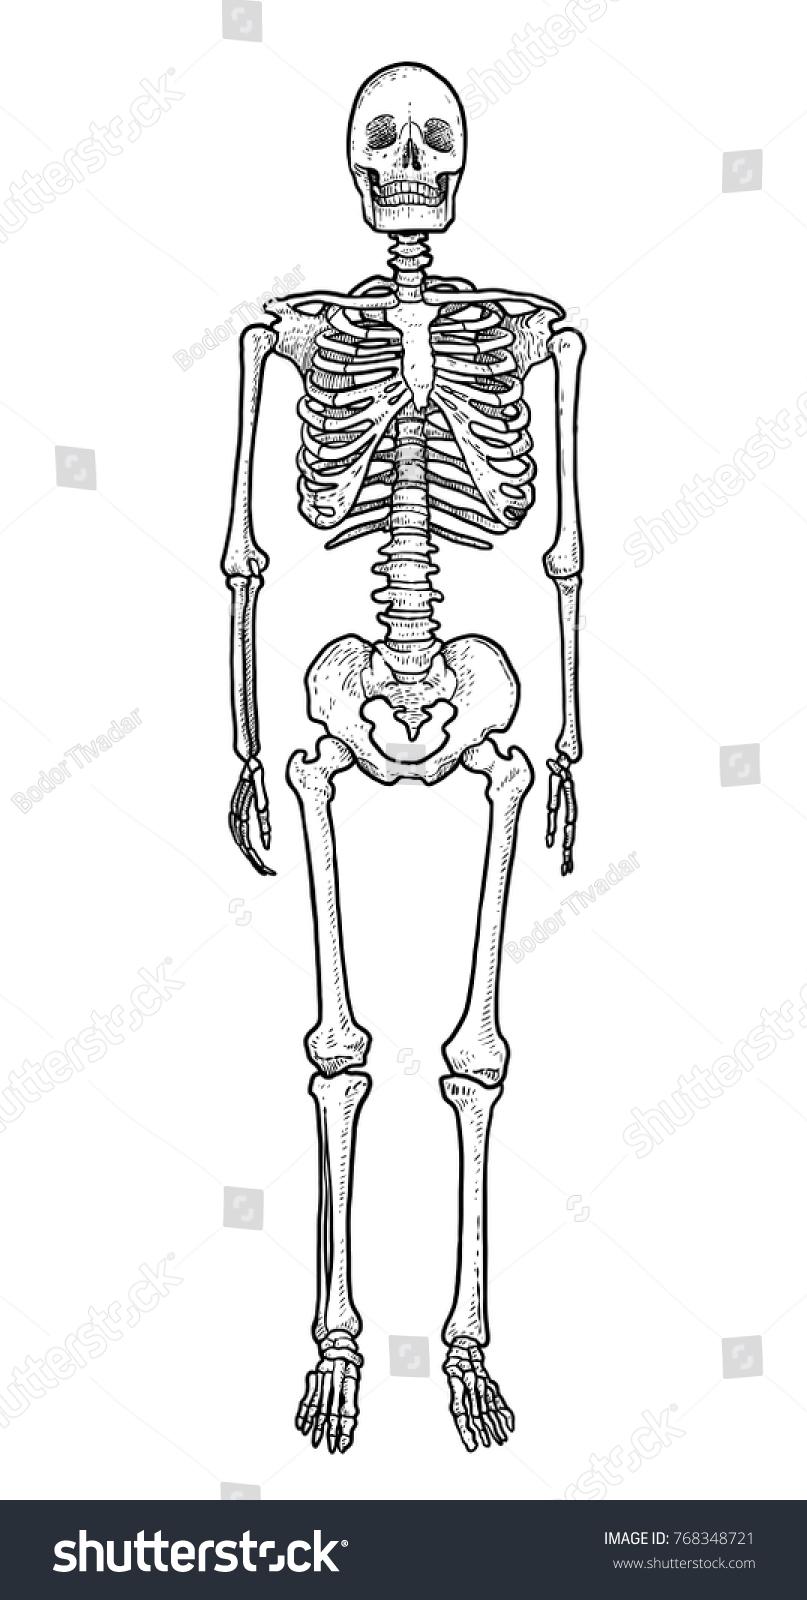 Human Skeleton Illustration Drawing Engraving Ink Stock Vector